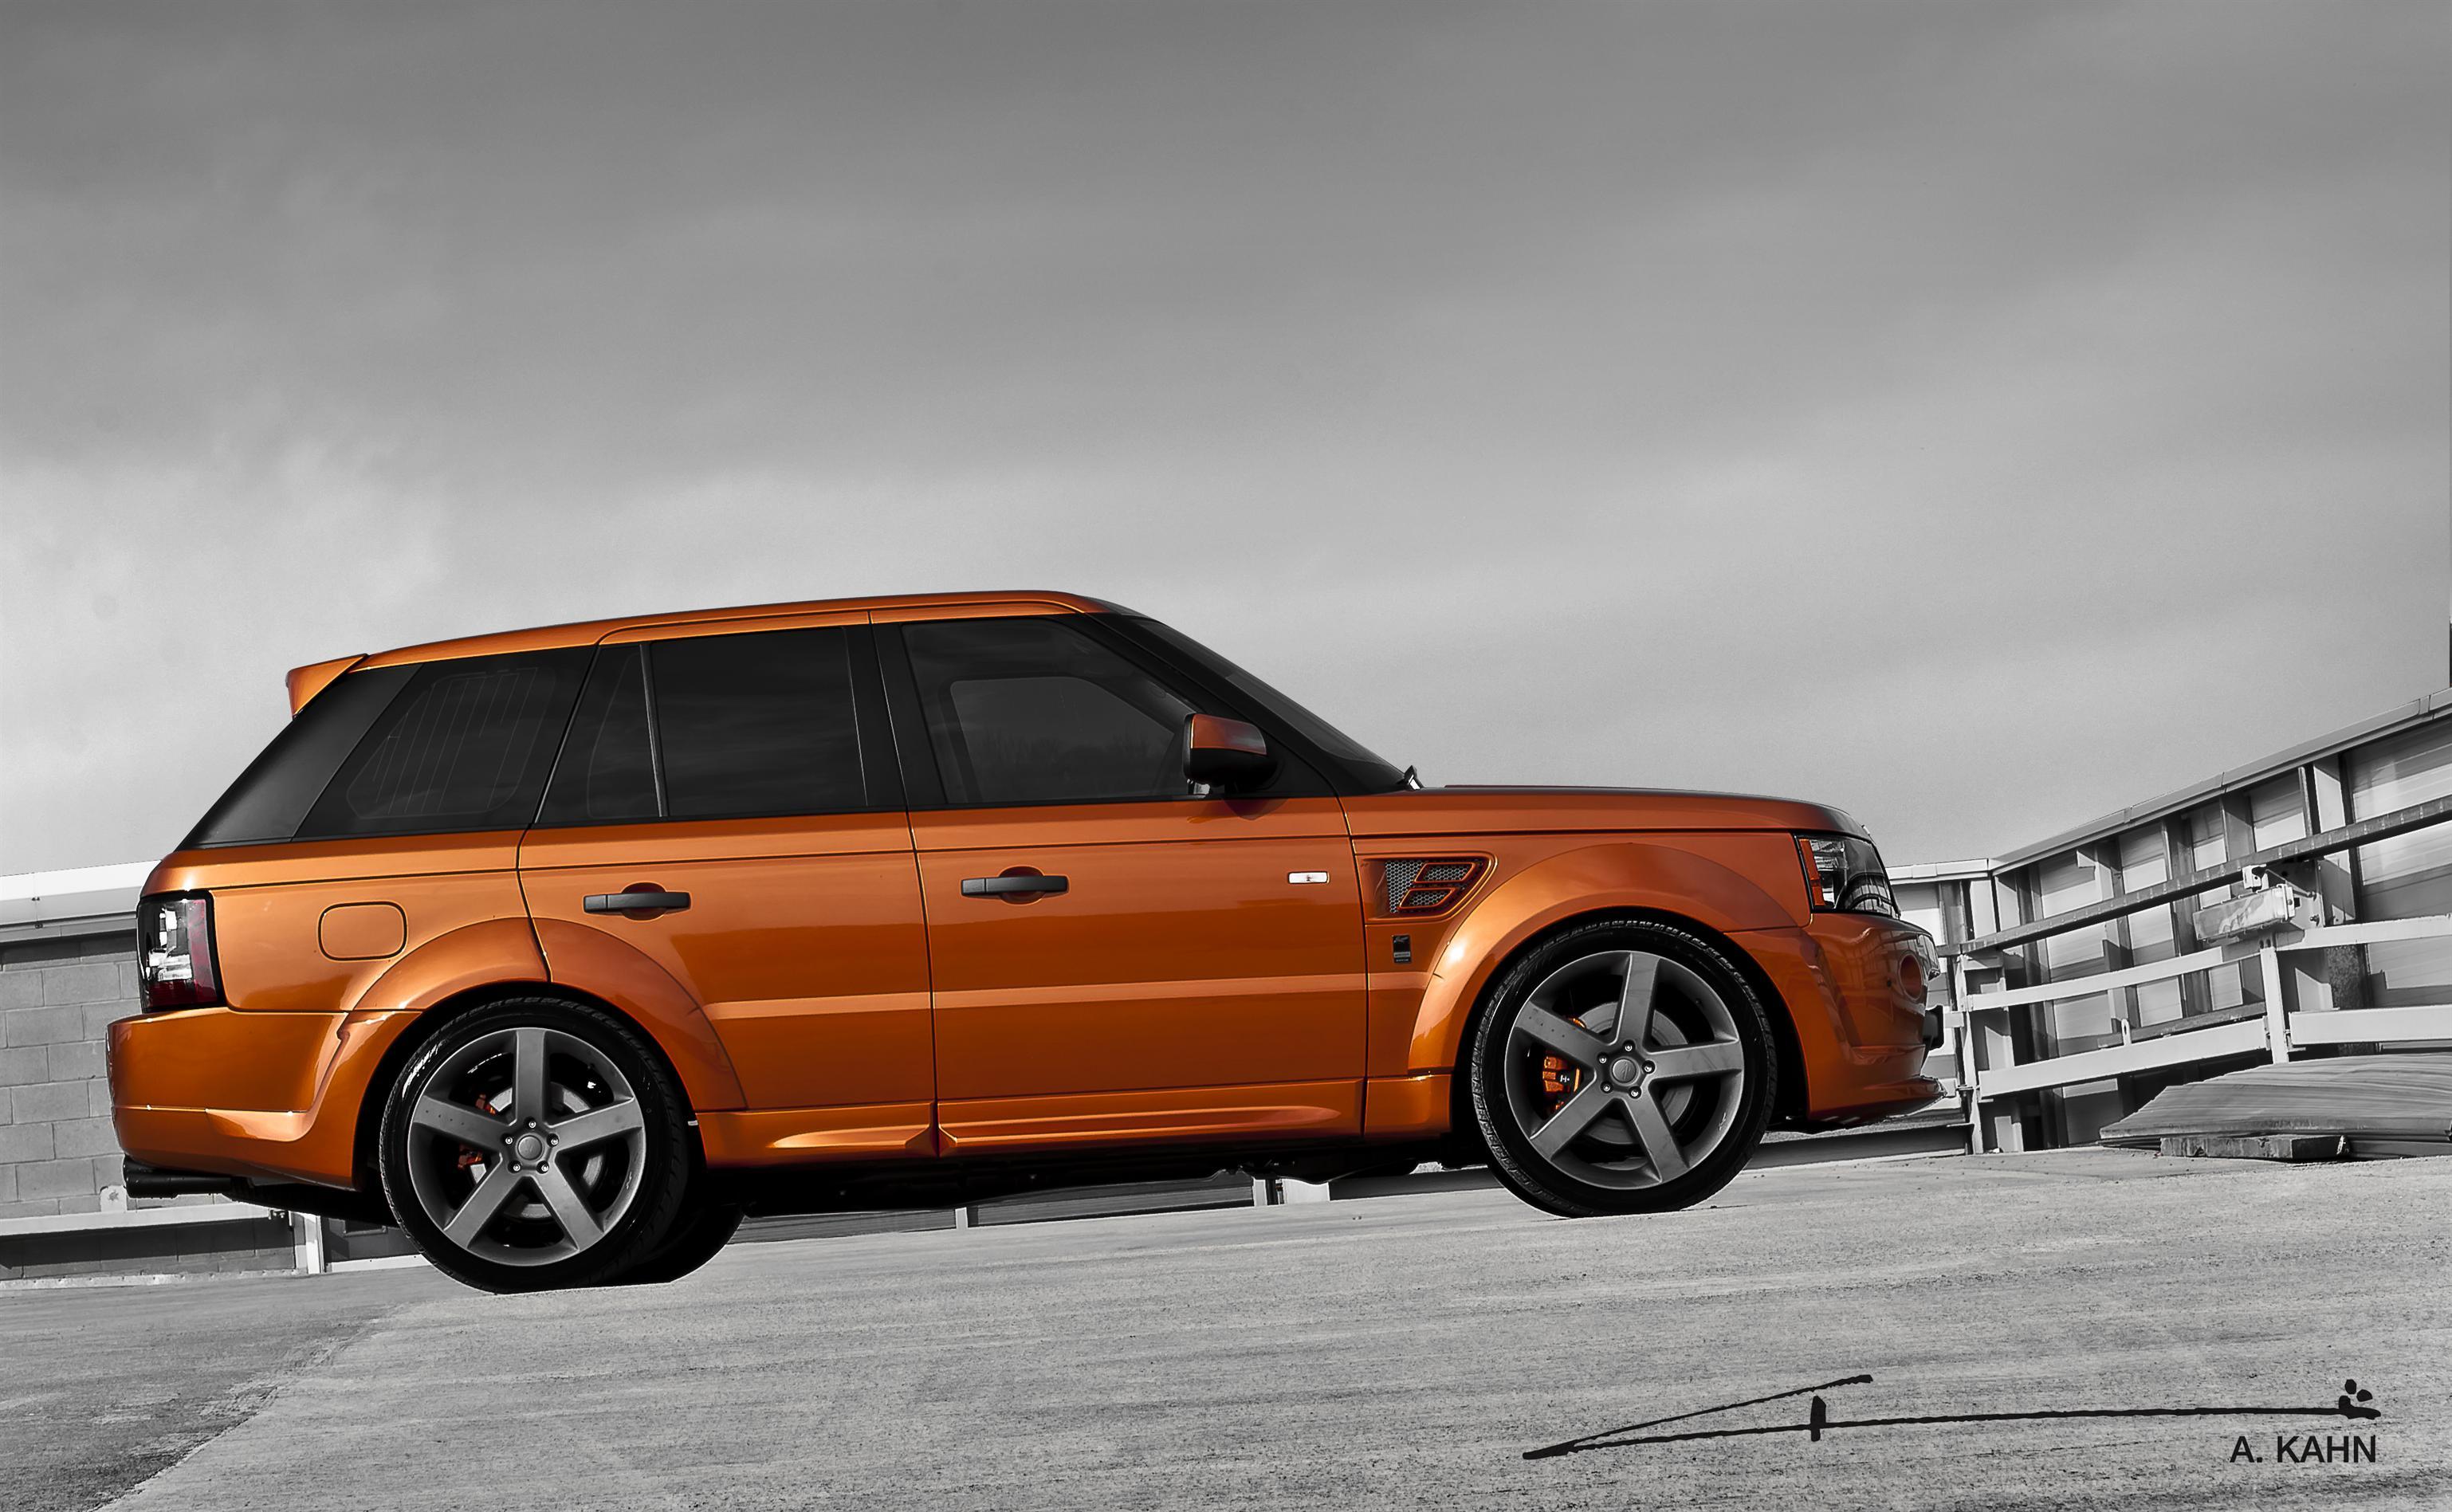 Range Rover Sport Vesuvius Kahn Side